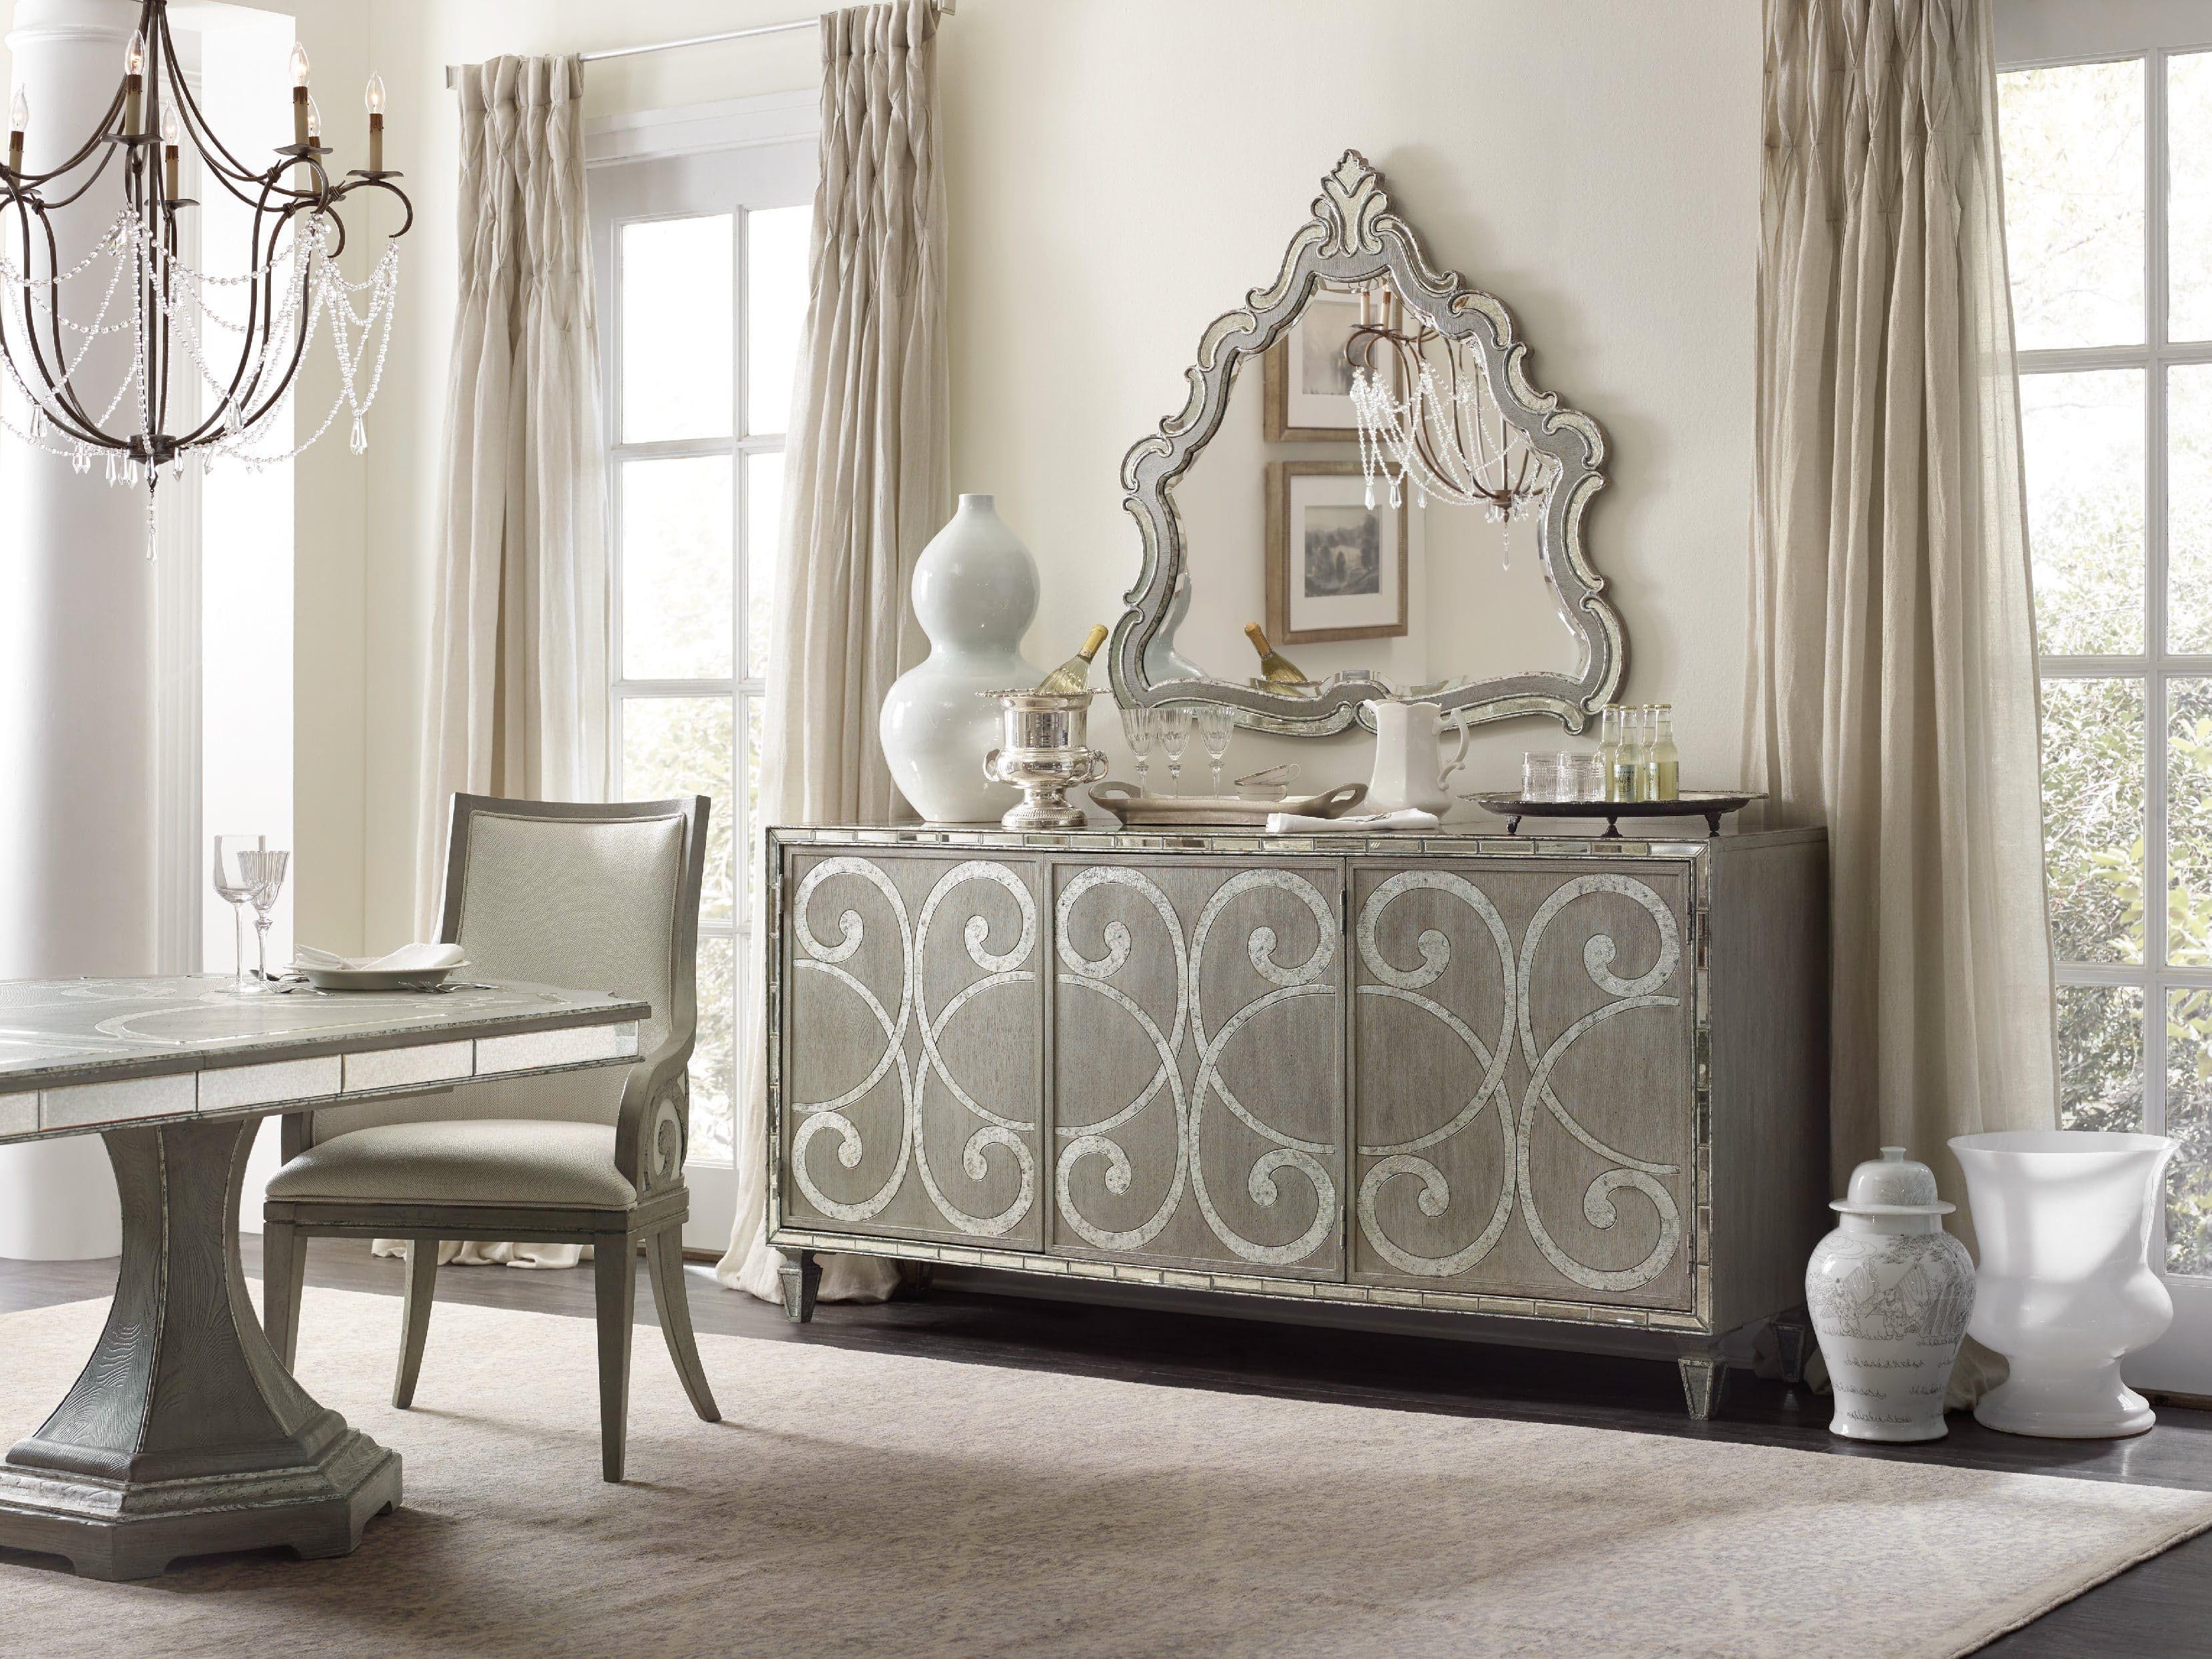 Furniture Dining Room Sanctuary Buffet 5603 75900 Ltbr Louis Shanks Austin Houston San Antonio Tx